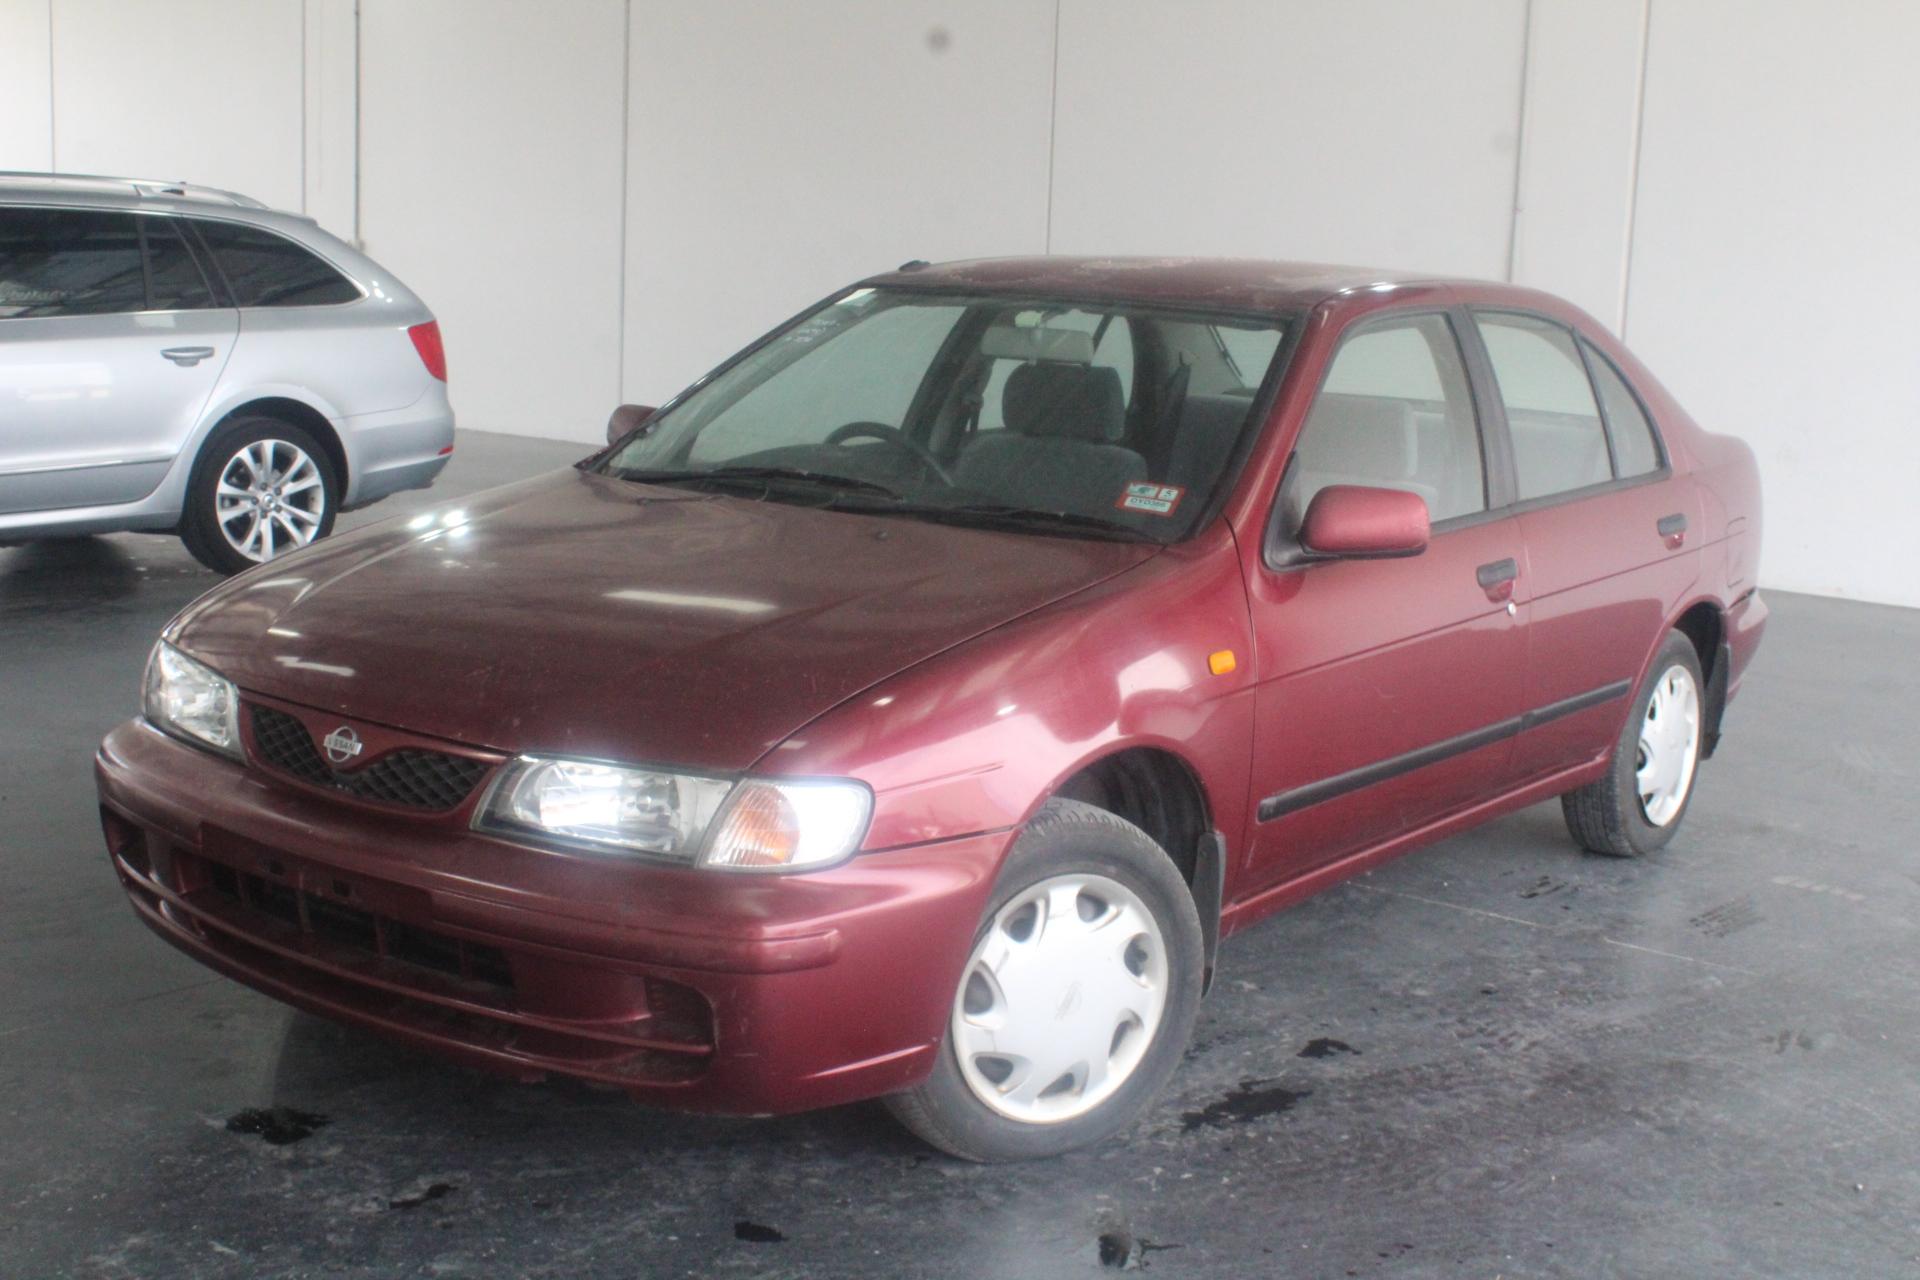 1998 Nissan Pulsar LX N15 Manual Sedan Auction (0001-3433997)   GraysOnline  Australia